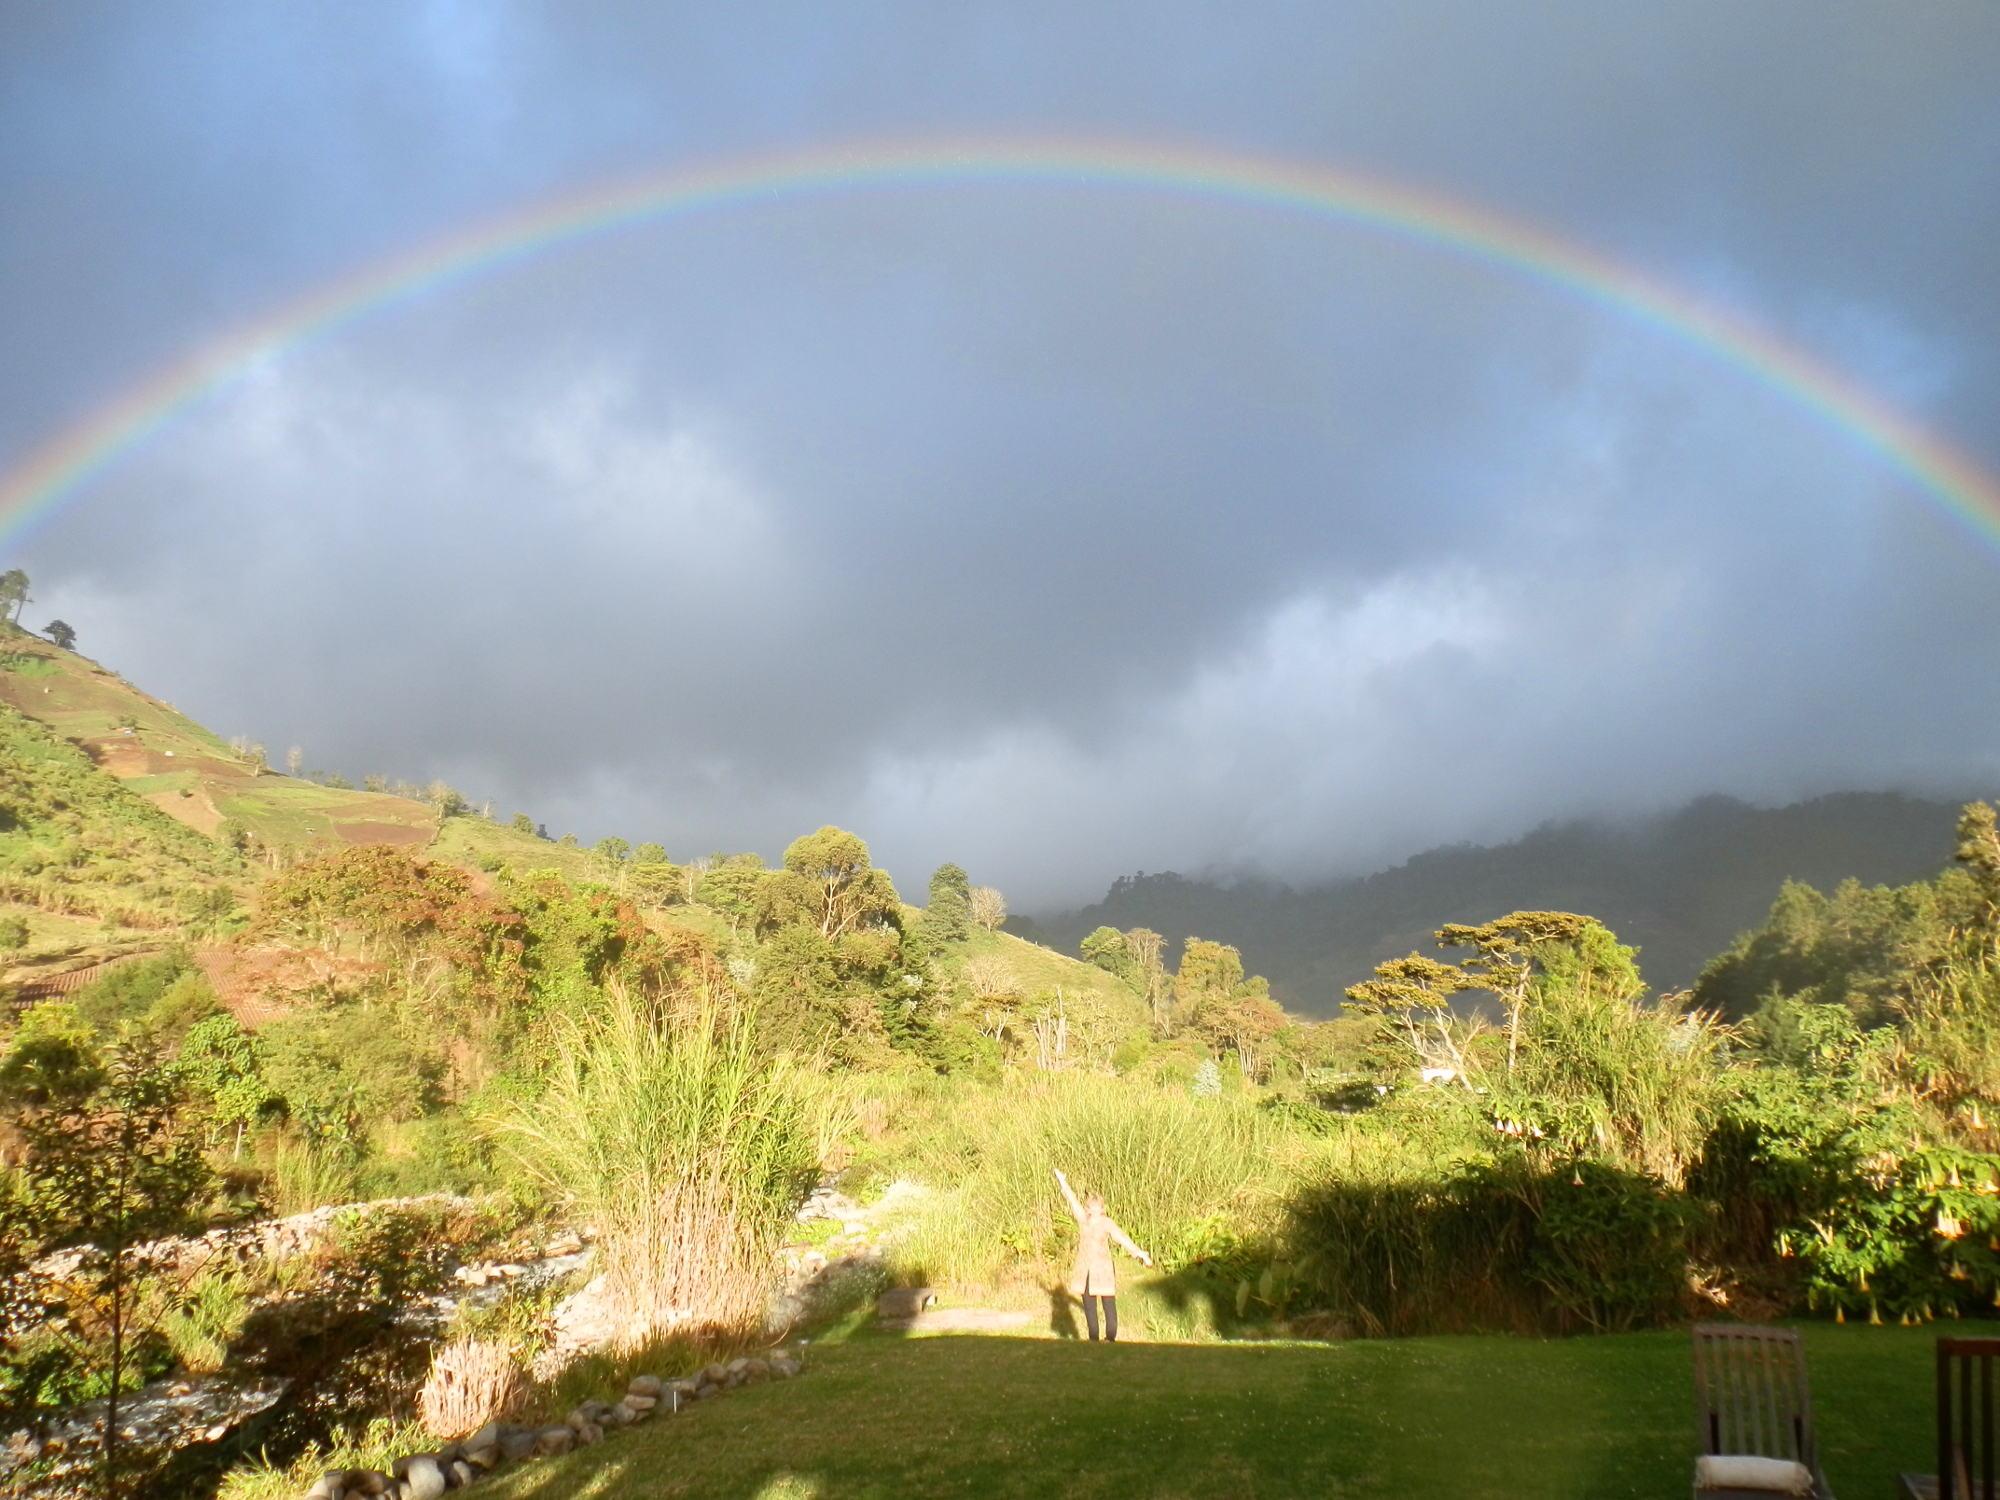 Gudrun standing under a rainbow